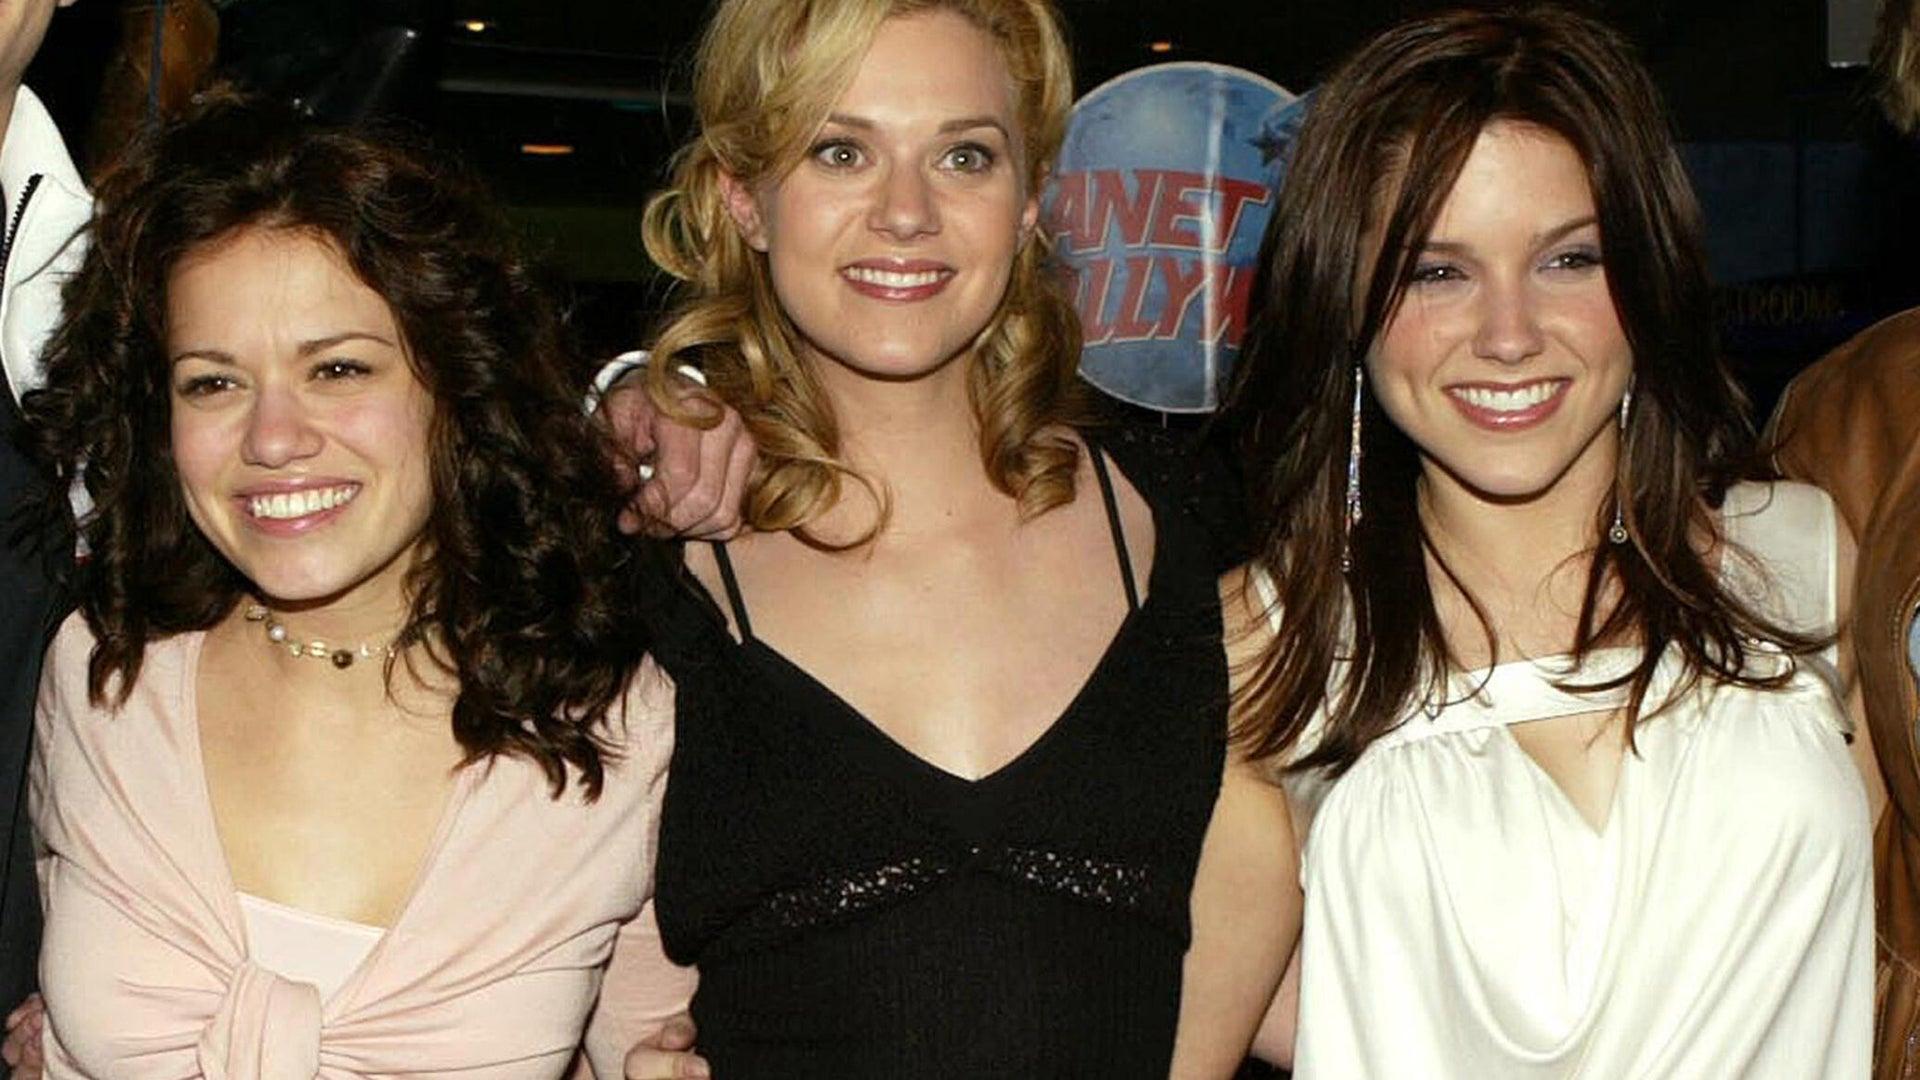 Hilarie Burton, Bethany Joy Lenz, and Sophia Bush